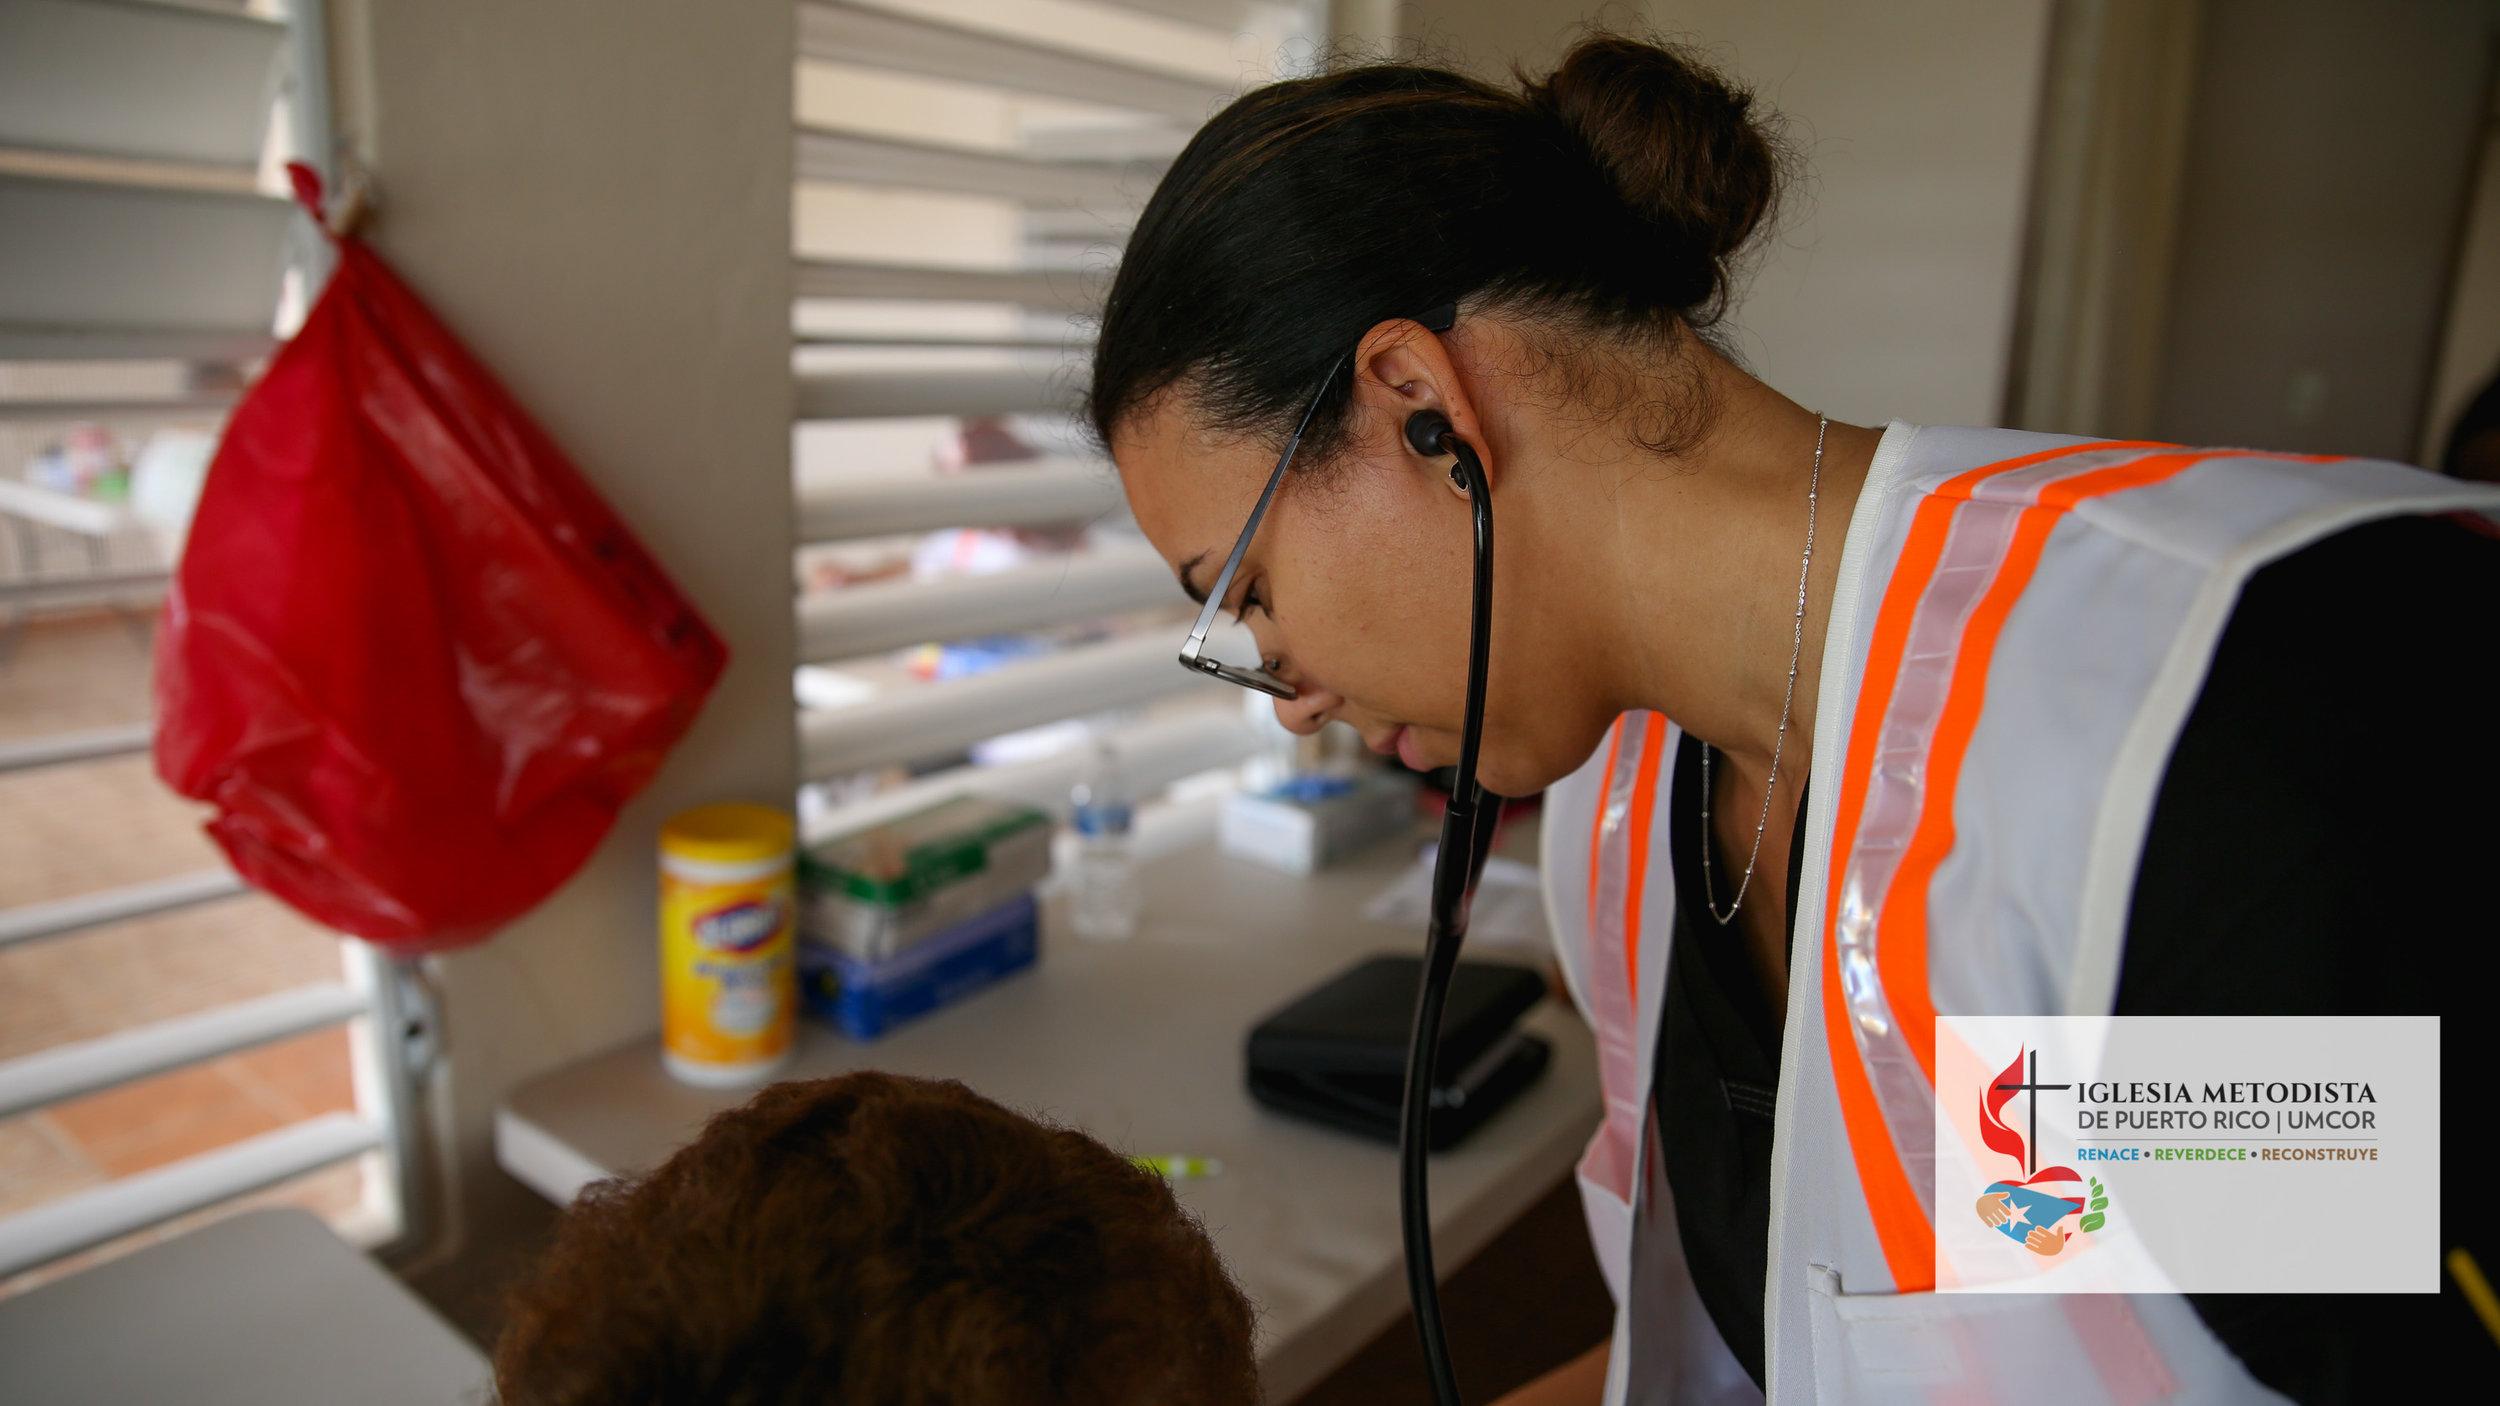 Fotos Clínicas de Salud Vieques_Abril 2018-ESG52357.JPG